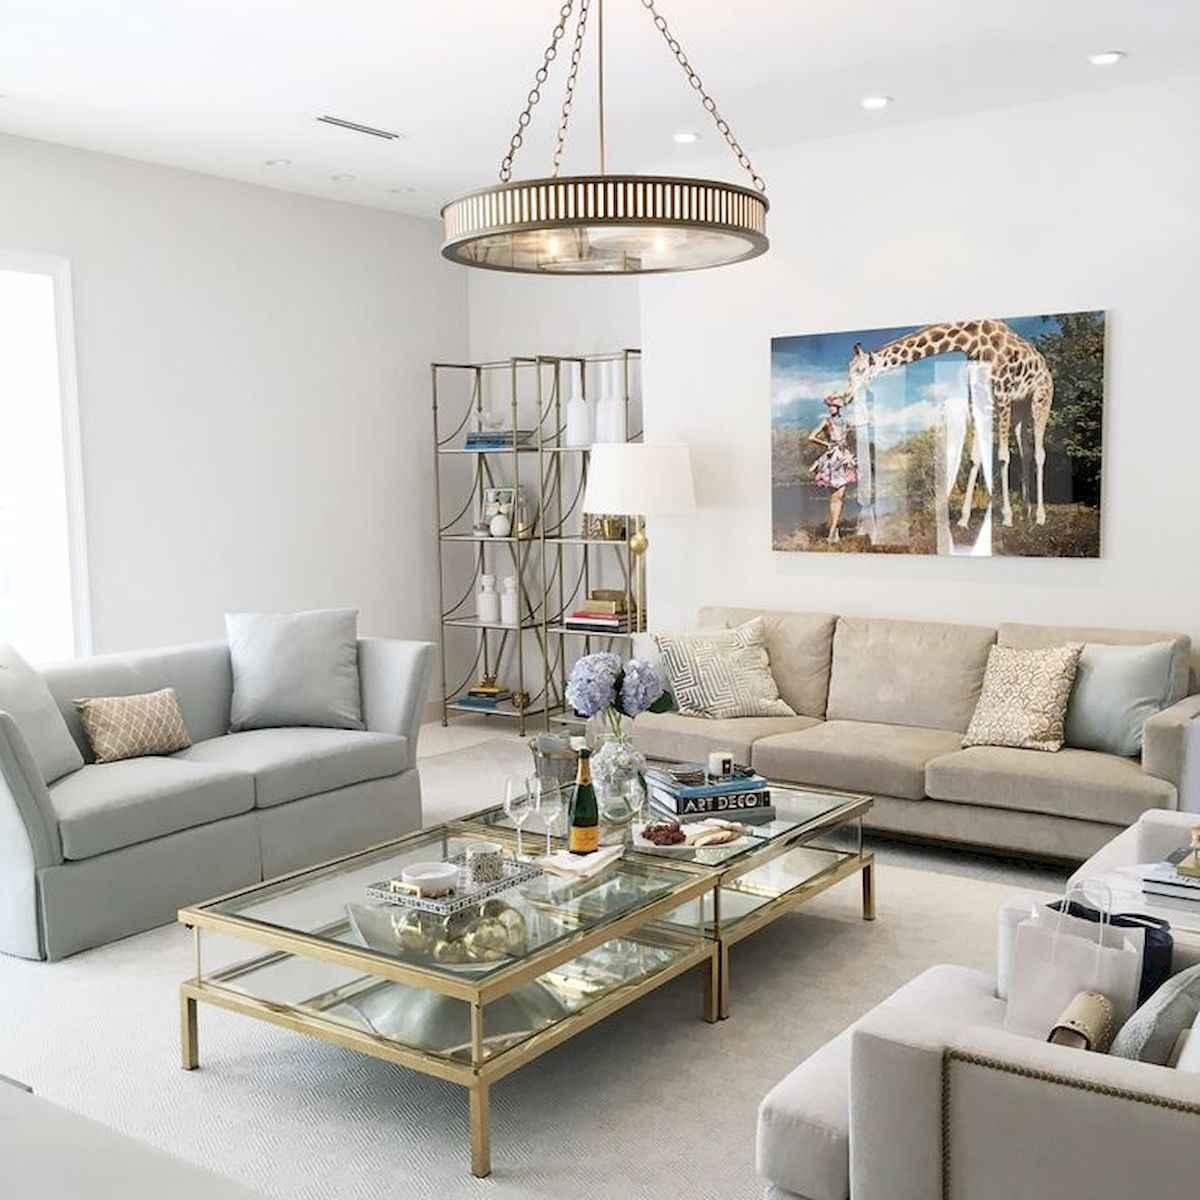 60 Farmhouse Living Room Lighting Ideas Decor And Design (10)